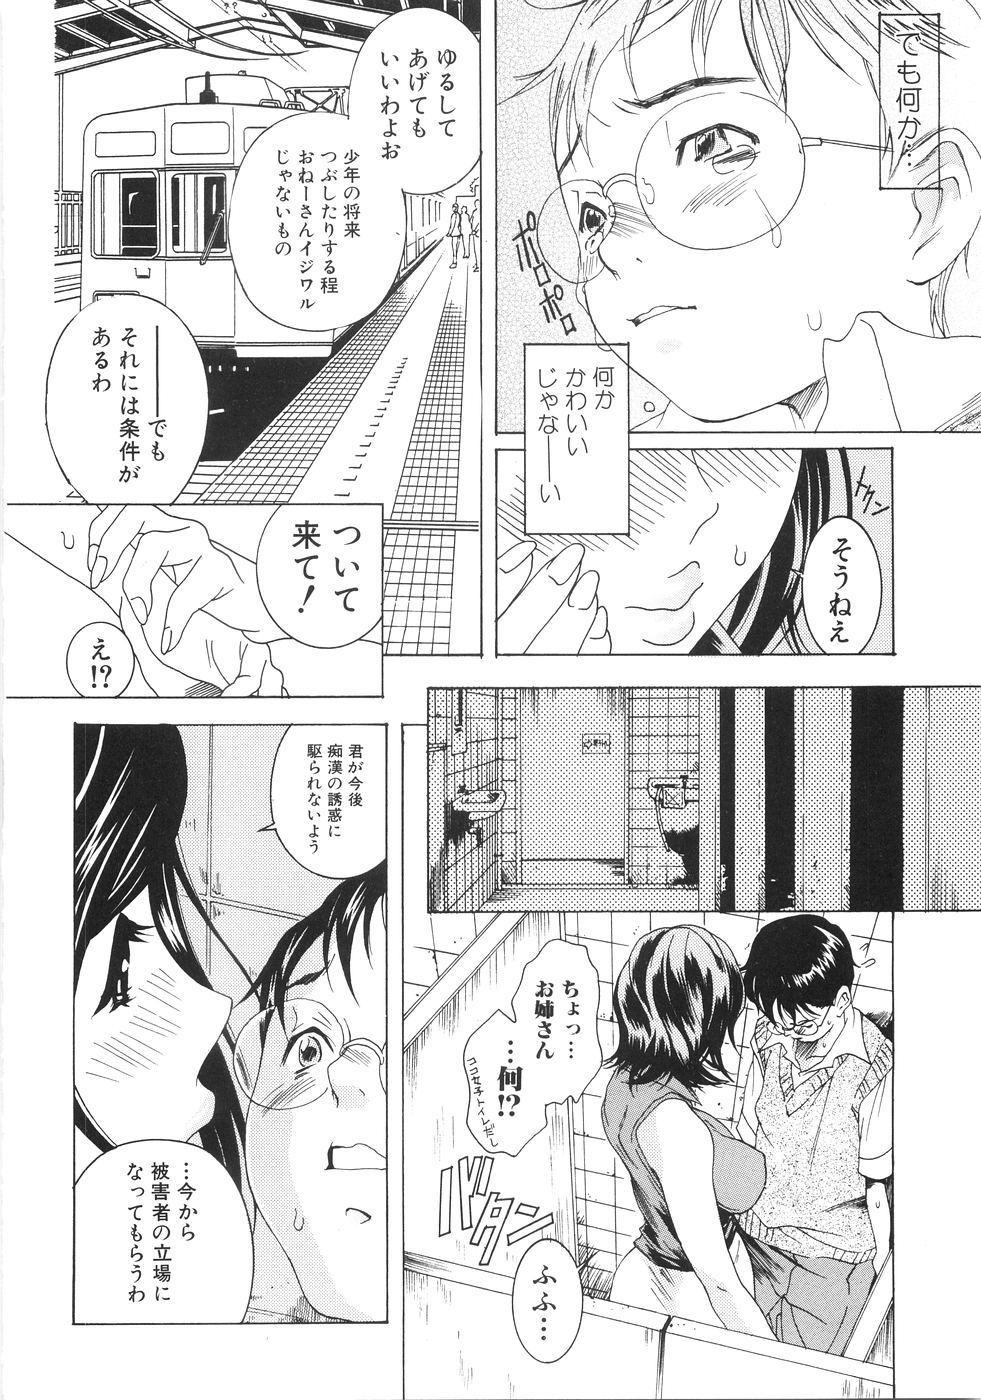 Honki Jiru - Cowper's Gland Liquid? or Love Juice?...?! 56